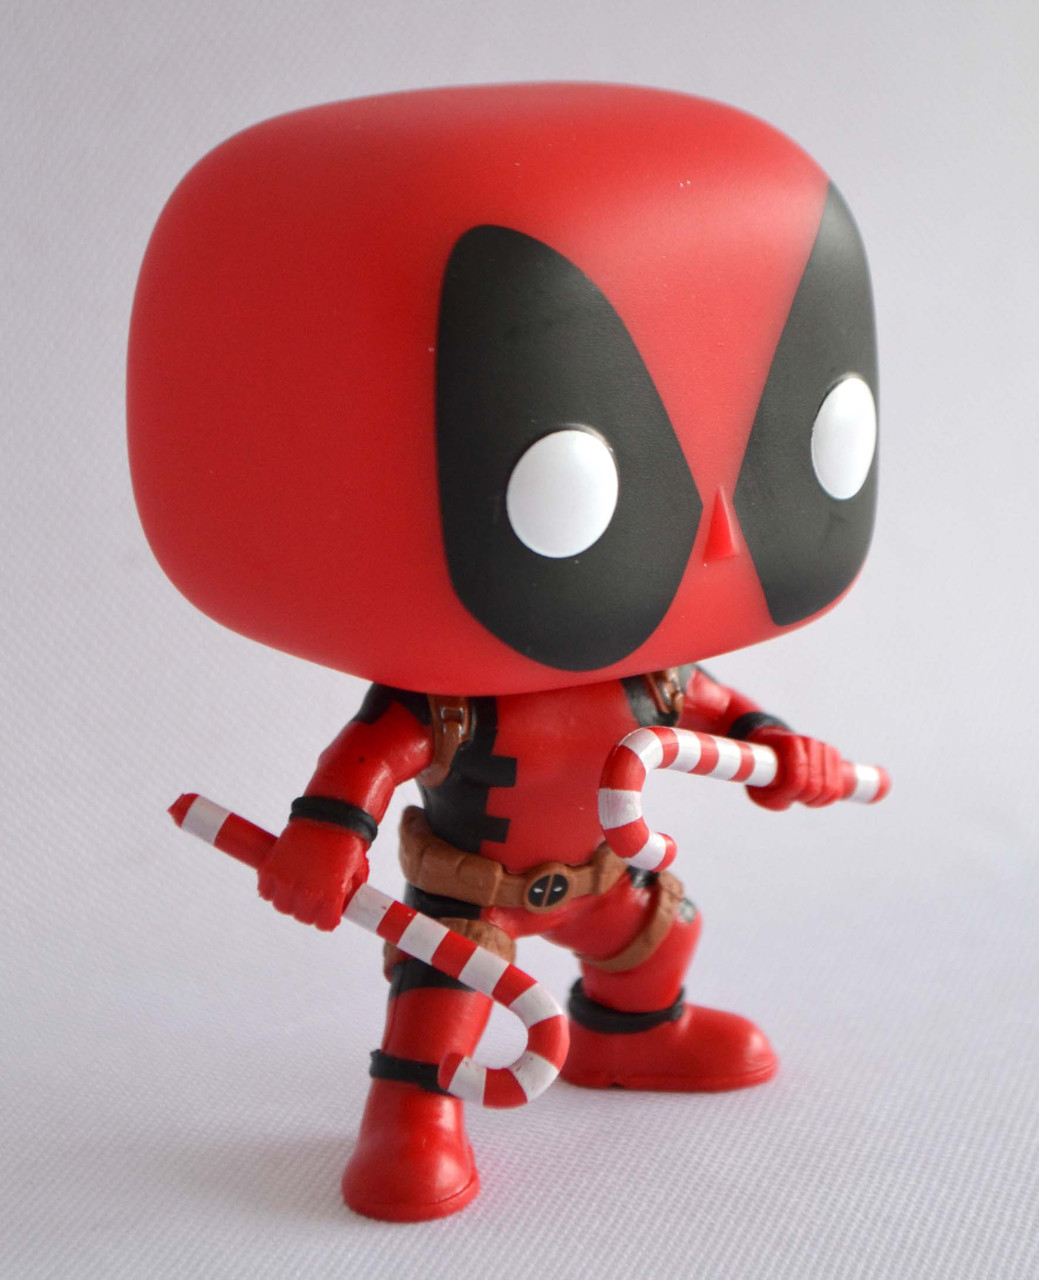 Коллекционная фигурка Funko Pop! Marvel: Deadpool with candy